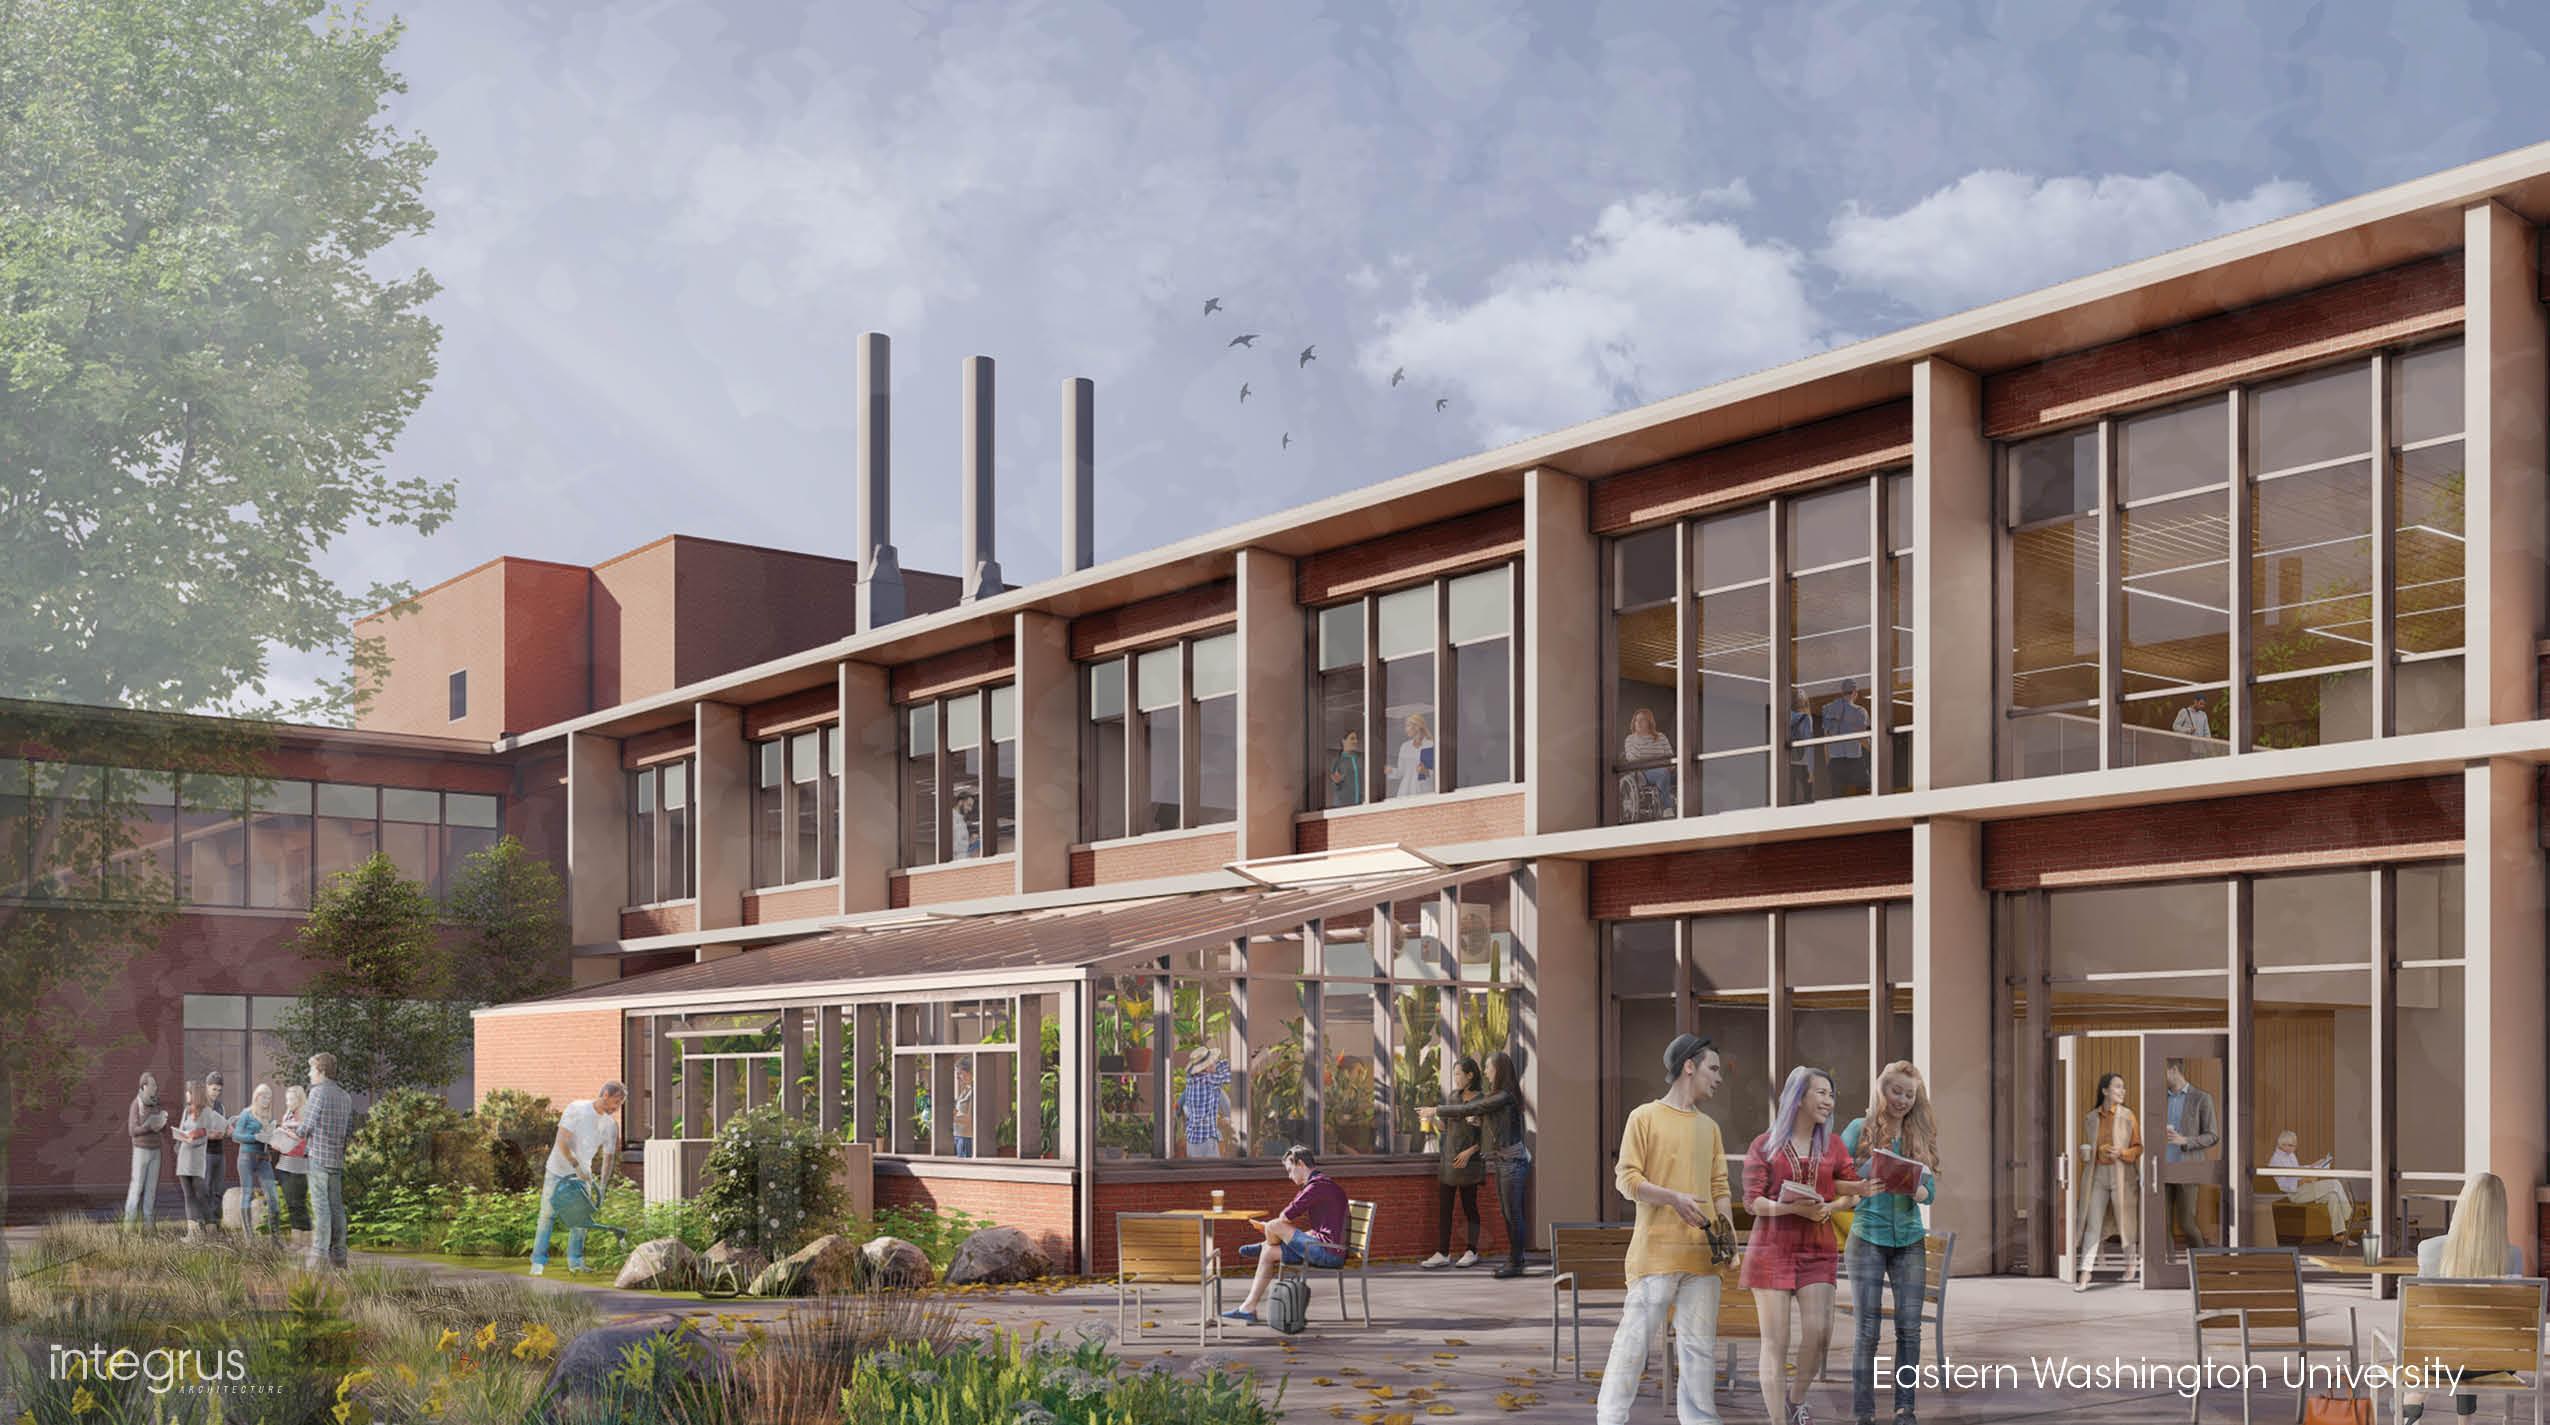 Eastern Washington University<br/>Science Building Renovation